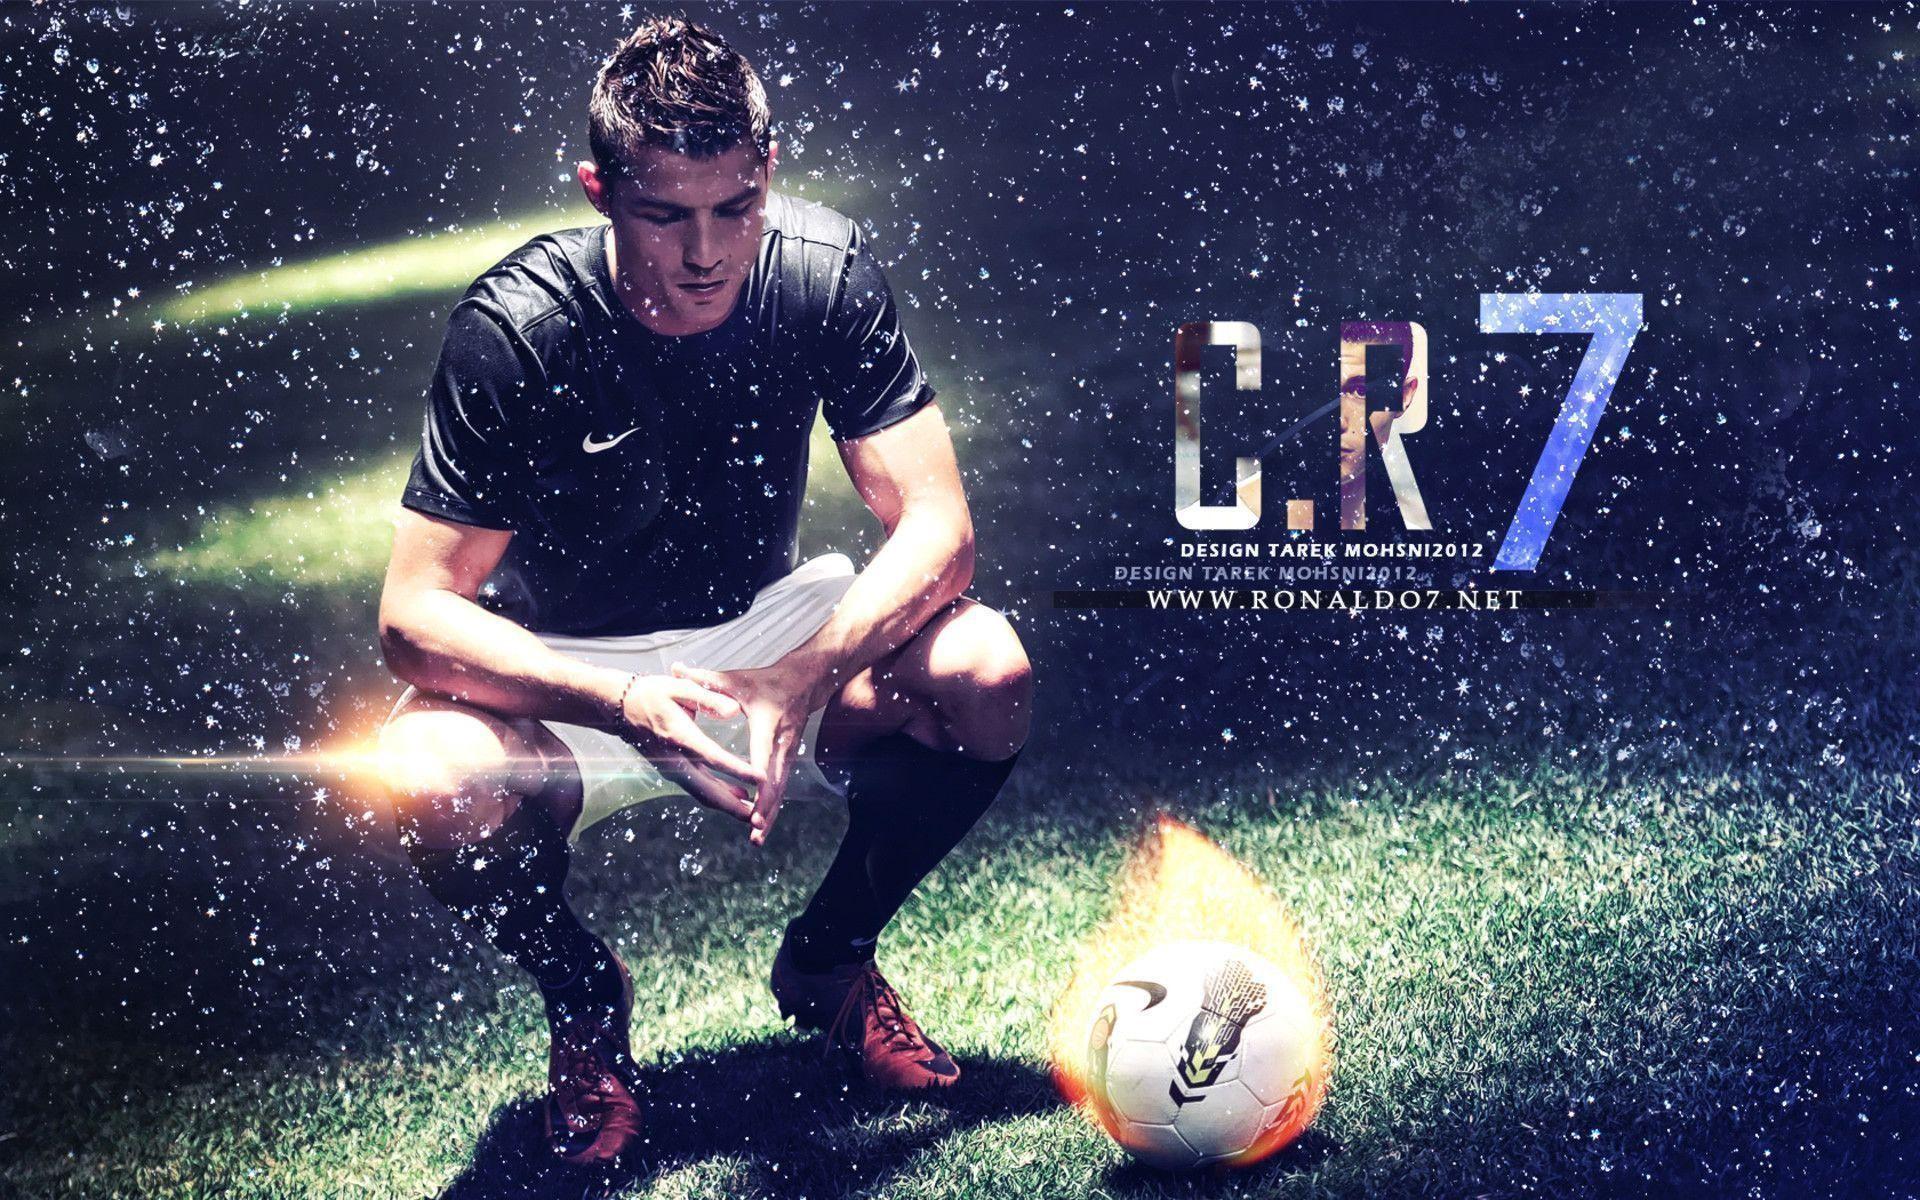 Cristiano Ronaldo Wallpaper Nike